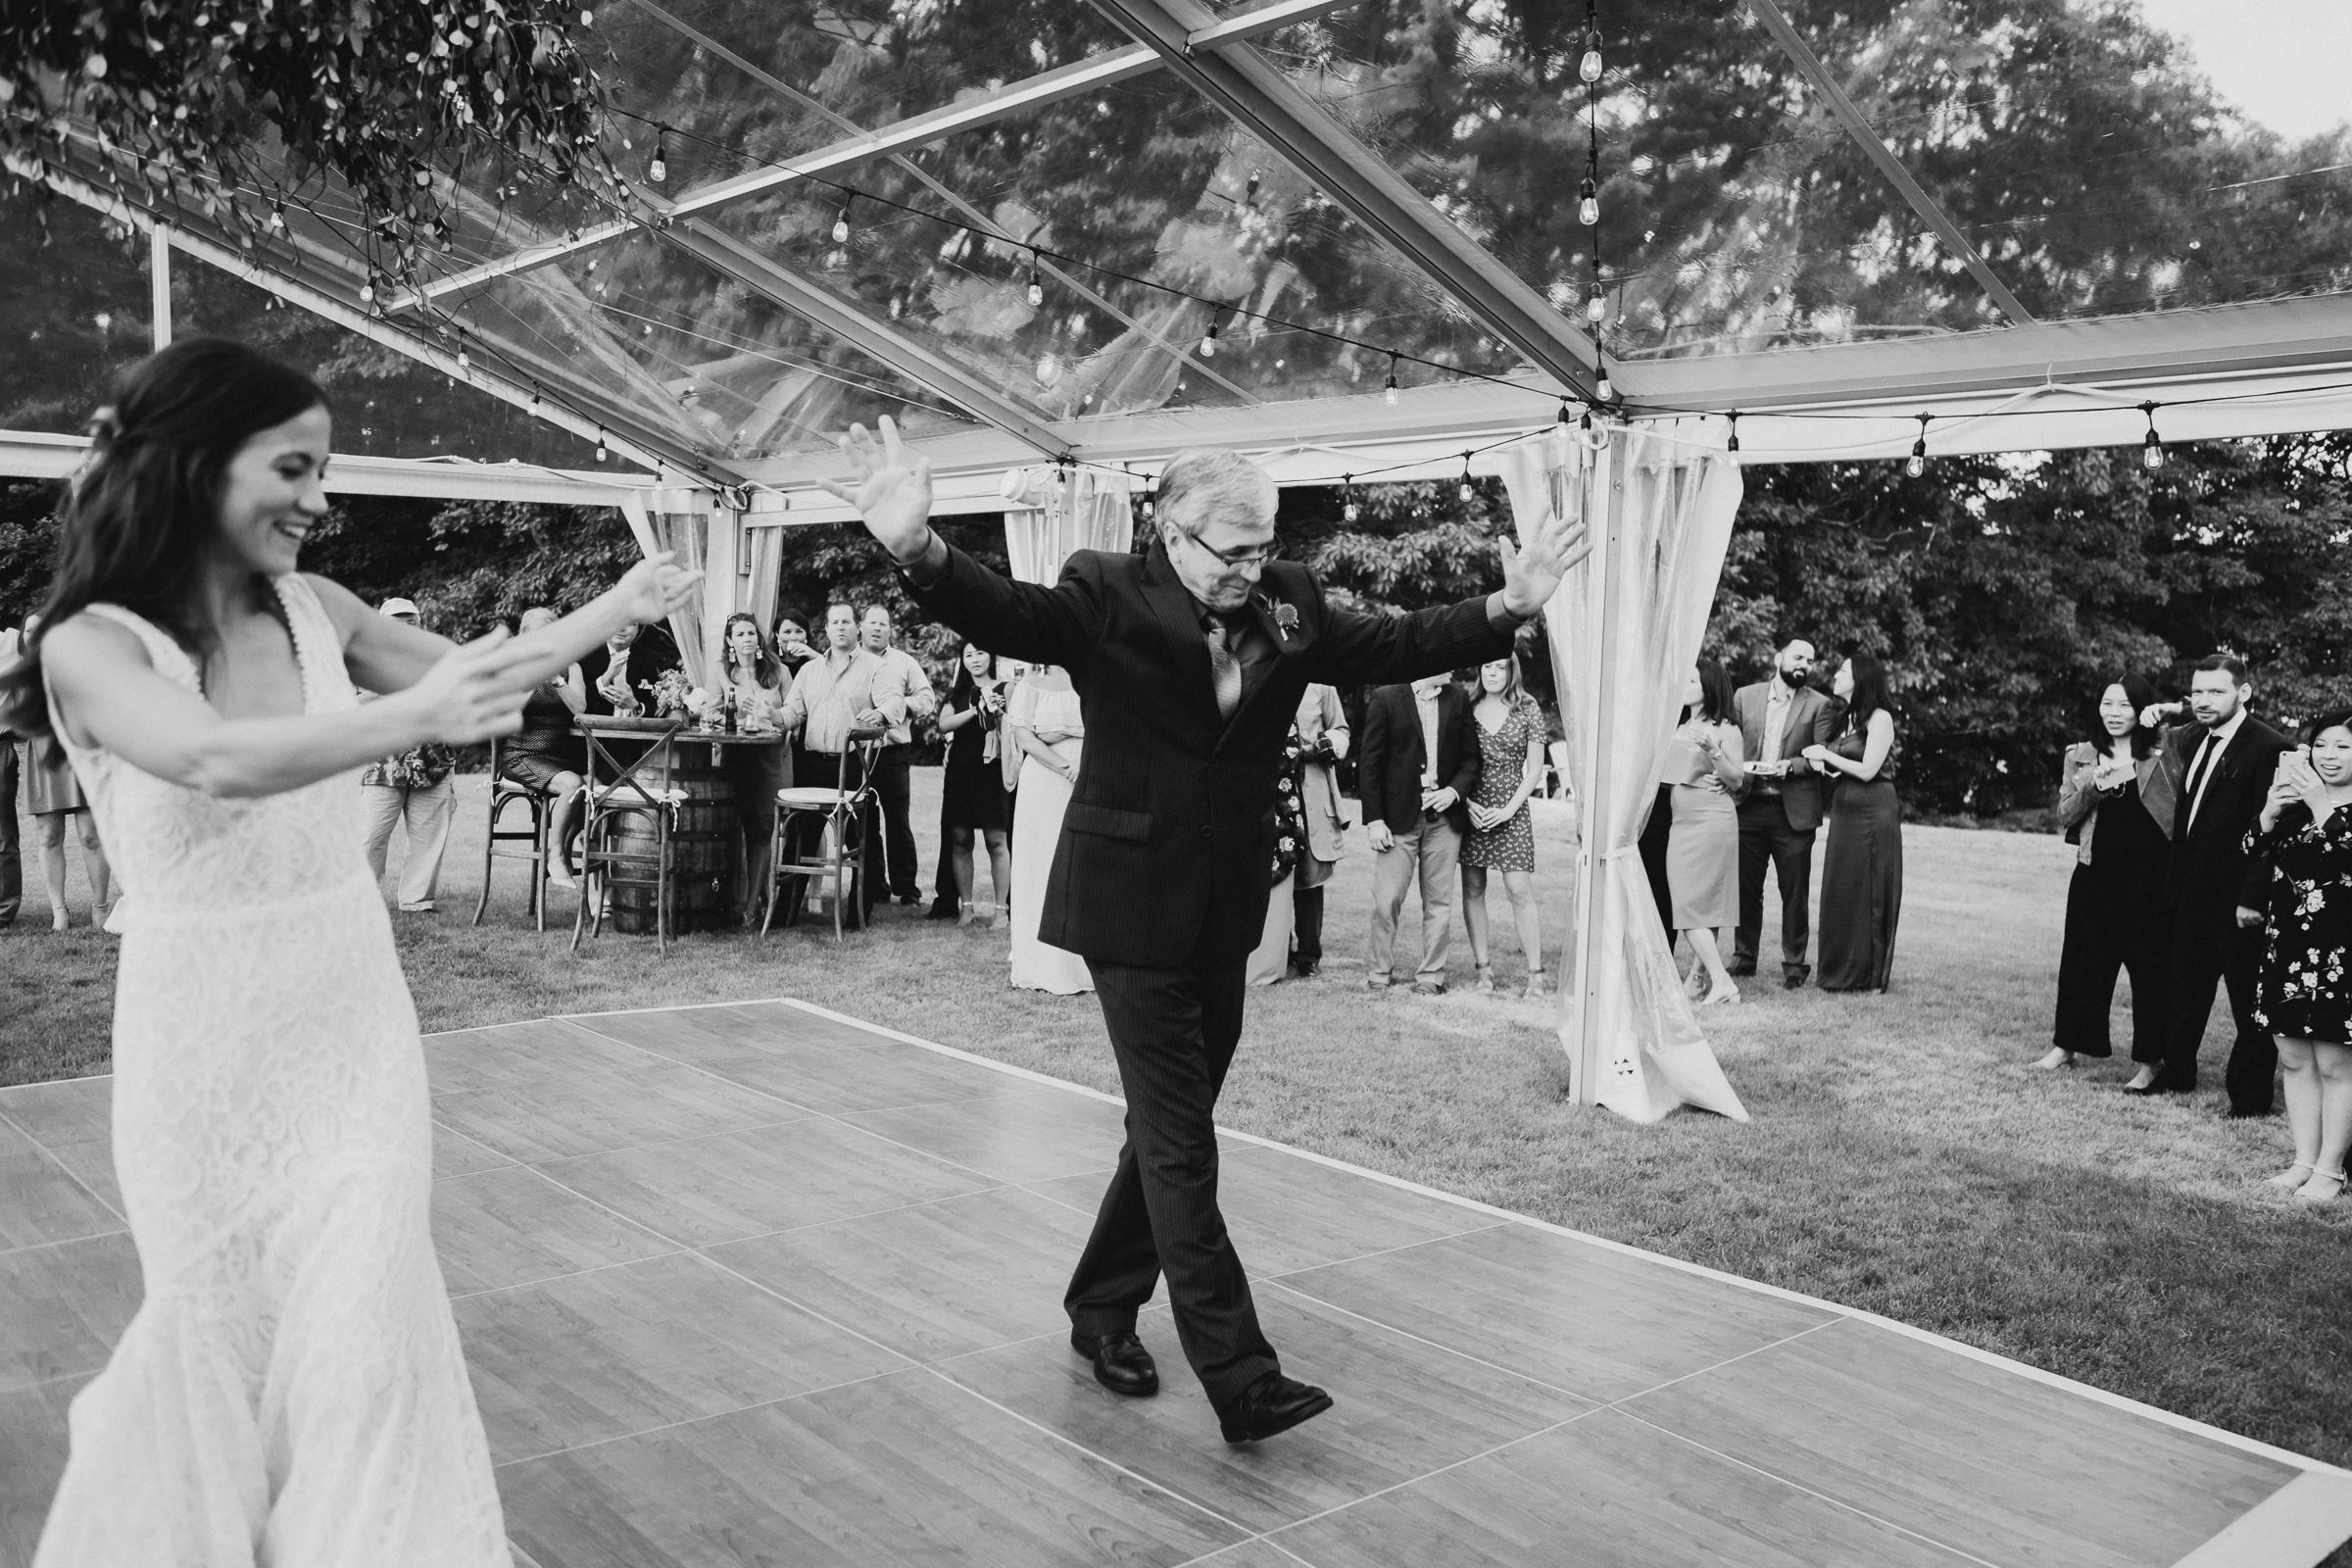 Marianmade-Farm-Wiscasset-Maine-Fine-Art-Documentary-Wedding-Photographer-Elvira-Kalviste-Photography-134.jpg